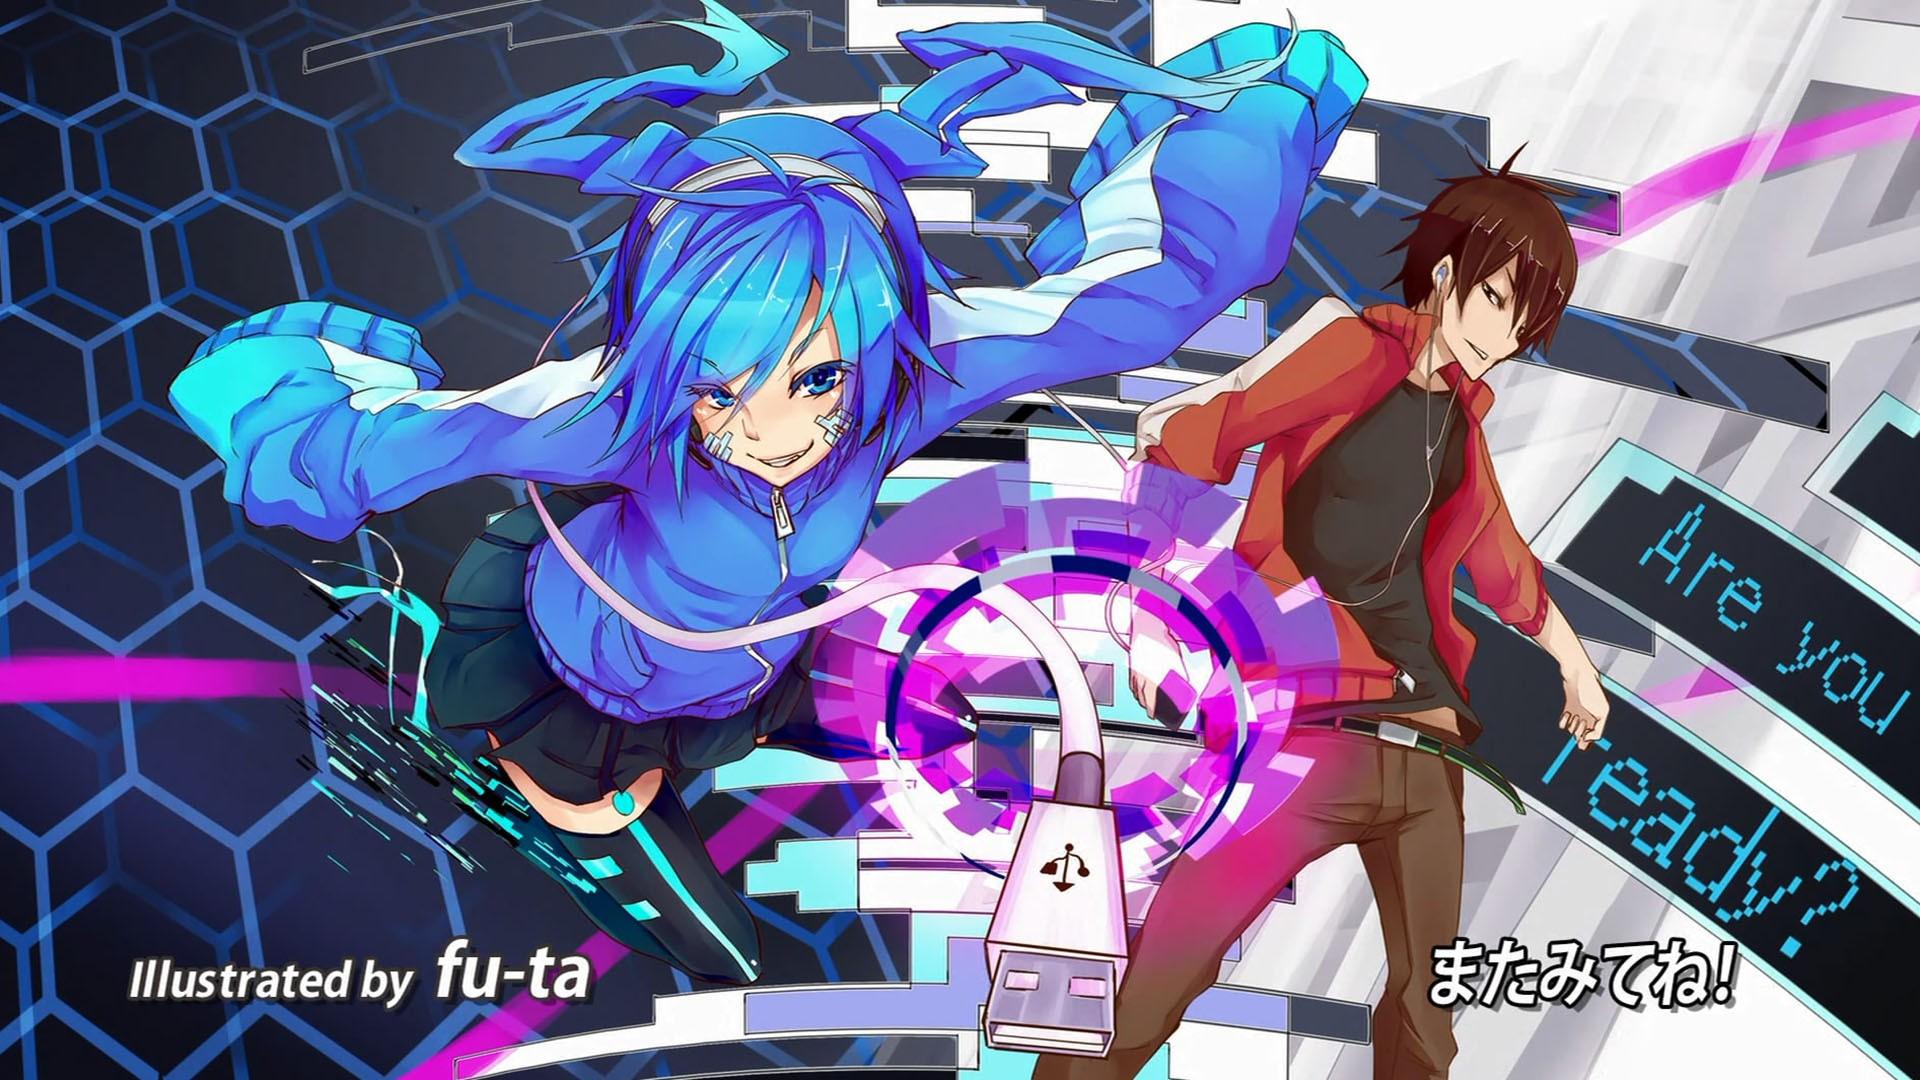 Anime Anime Girls Comics Kagerou Project Kisaragi Shintaro X Px Mangaka Comic Book Ene